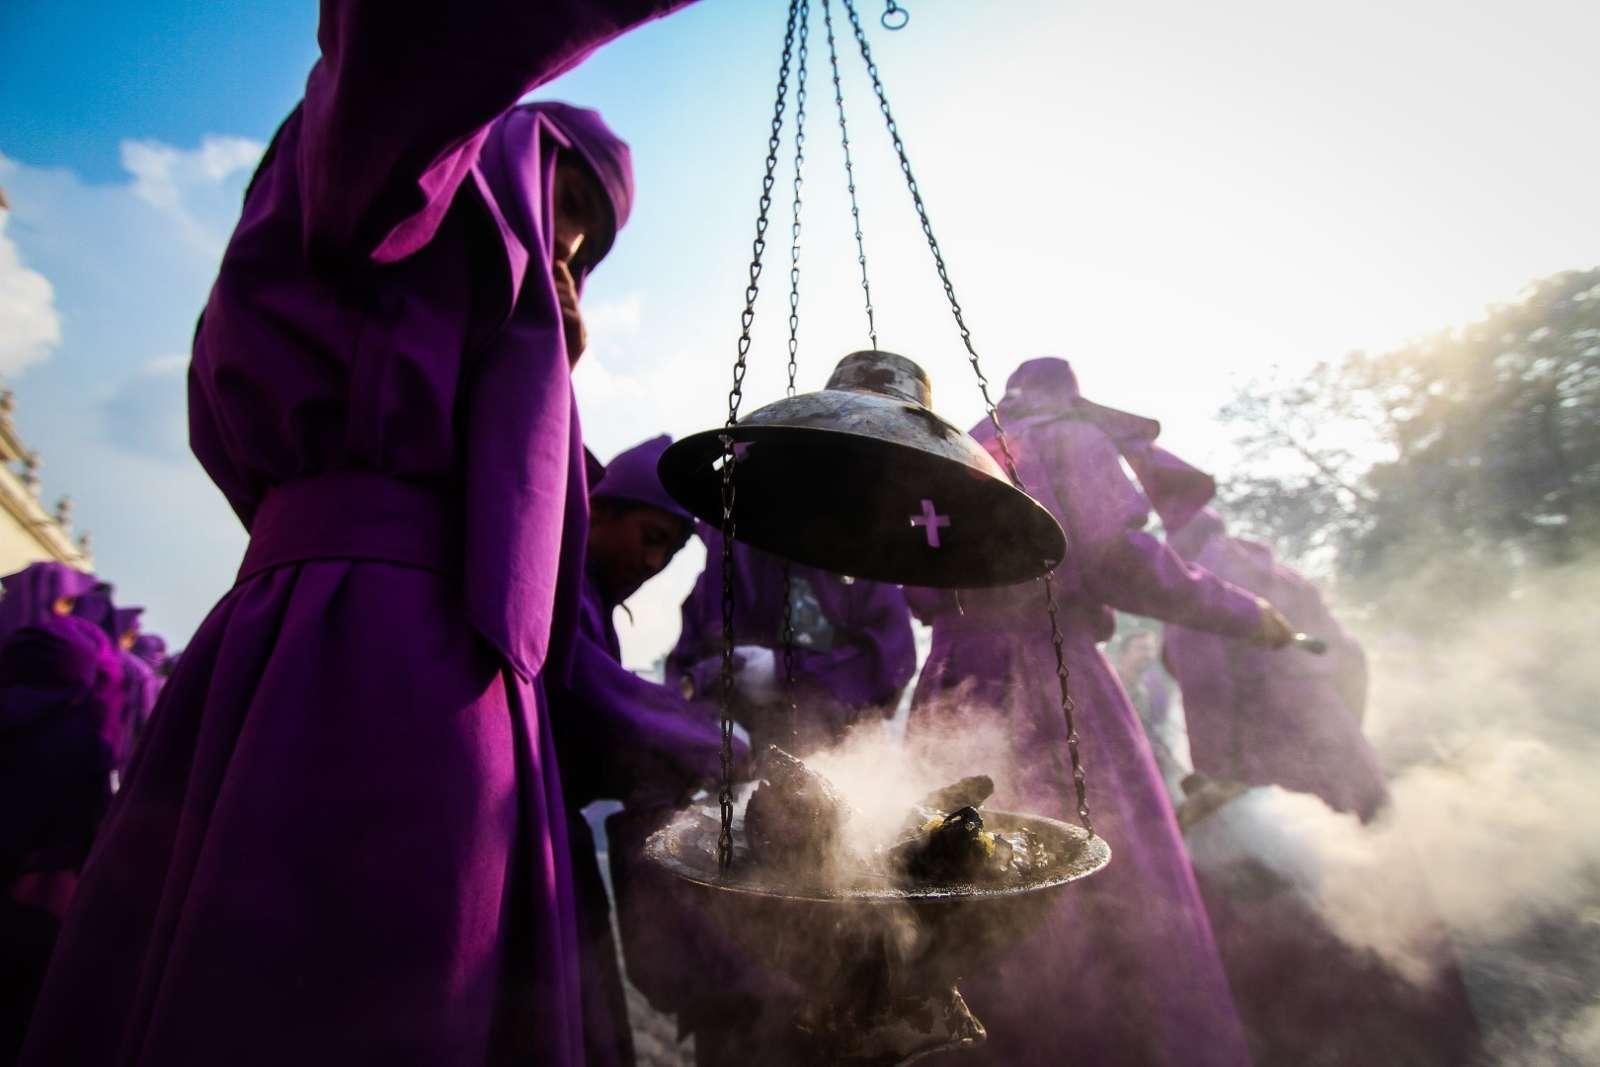 Burning incense during Semana Santa in Antigua, Guatemala